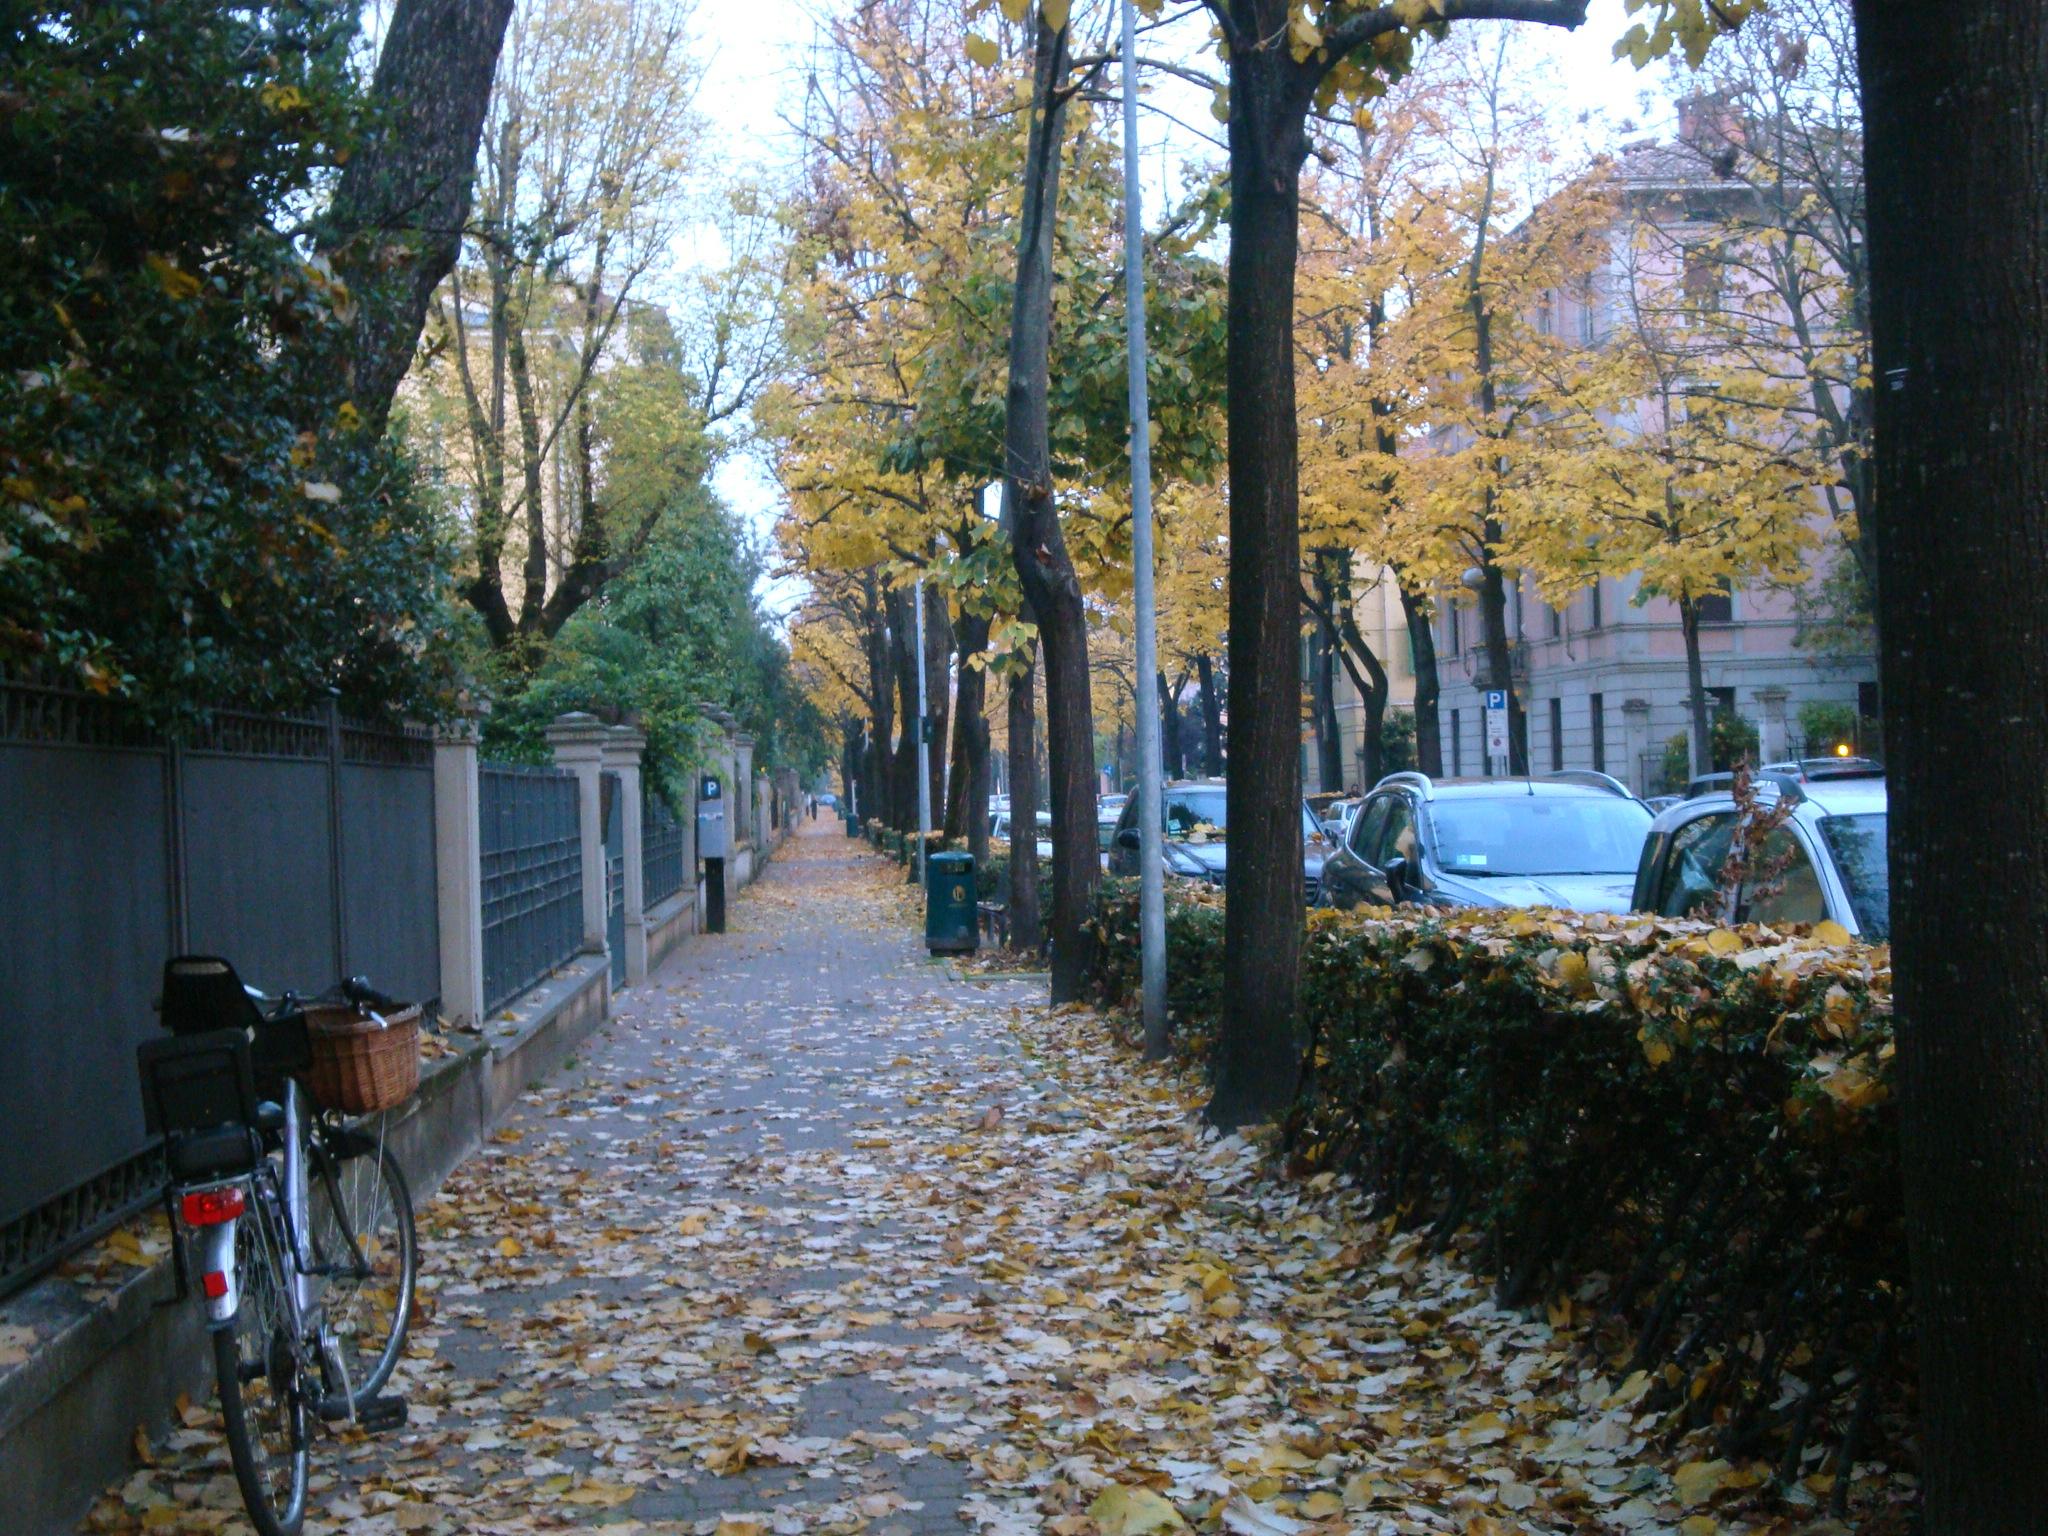 Via Campanini, where we lived